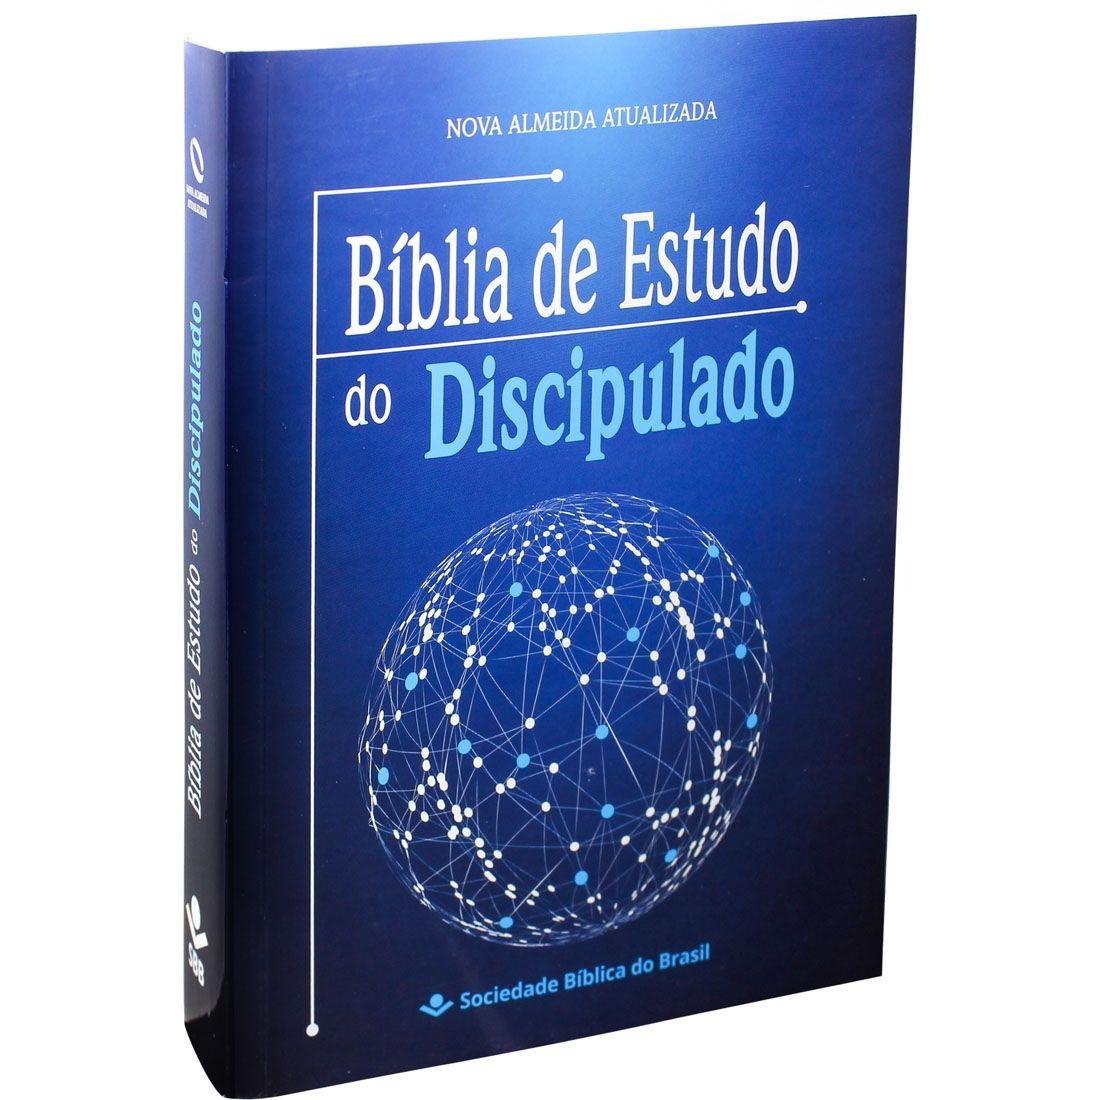 Bíblia de Estudo do Discipulado Brochura